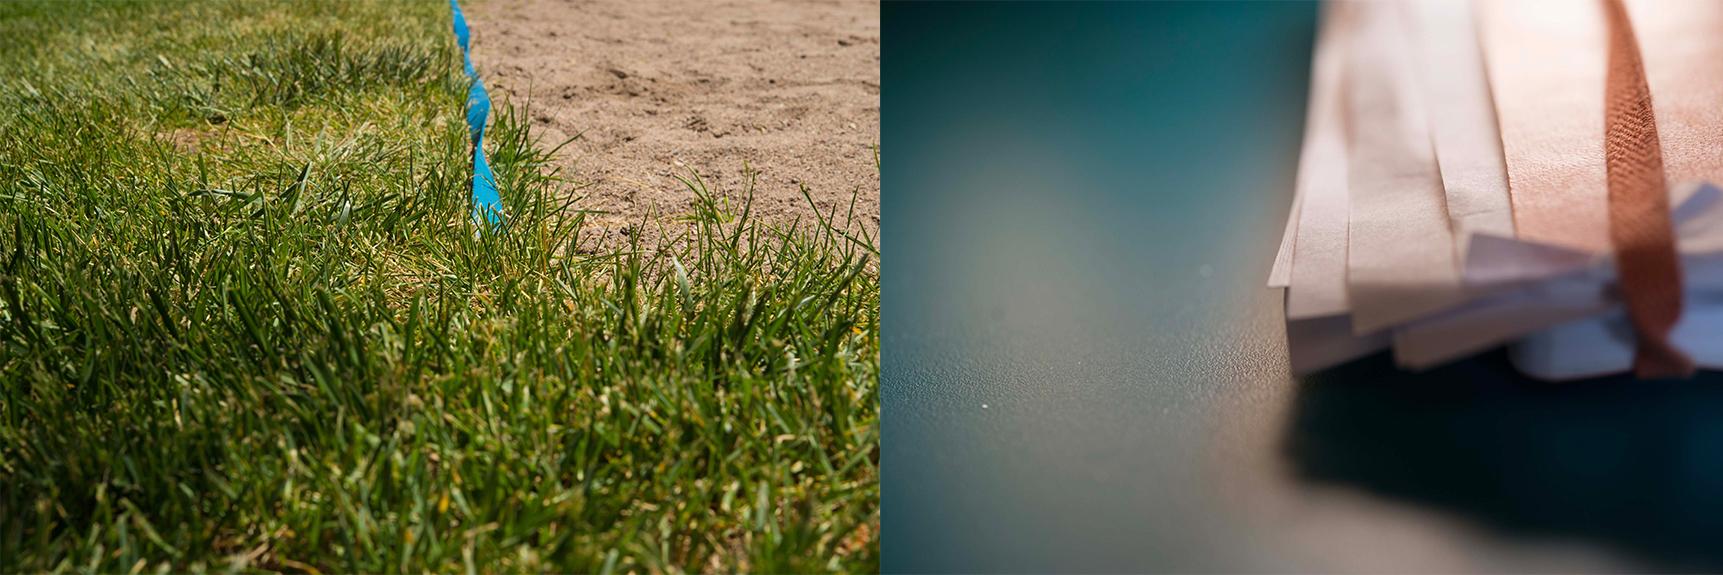 Grass-Orang Book.jpg